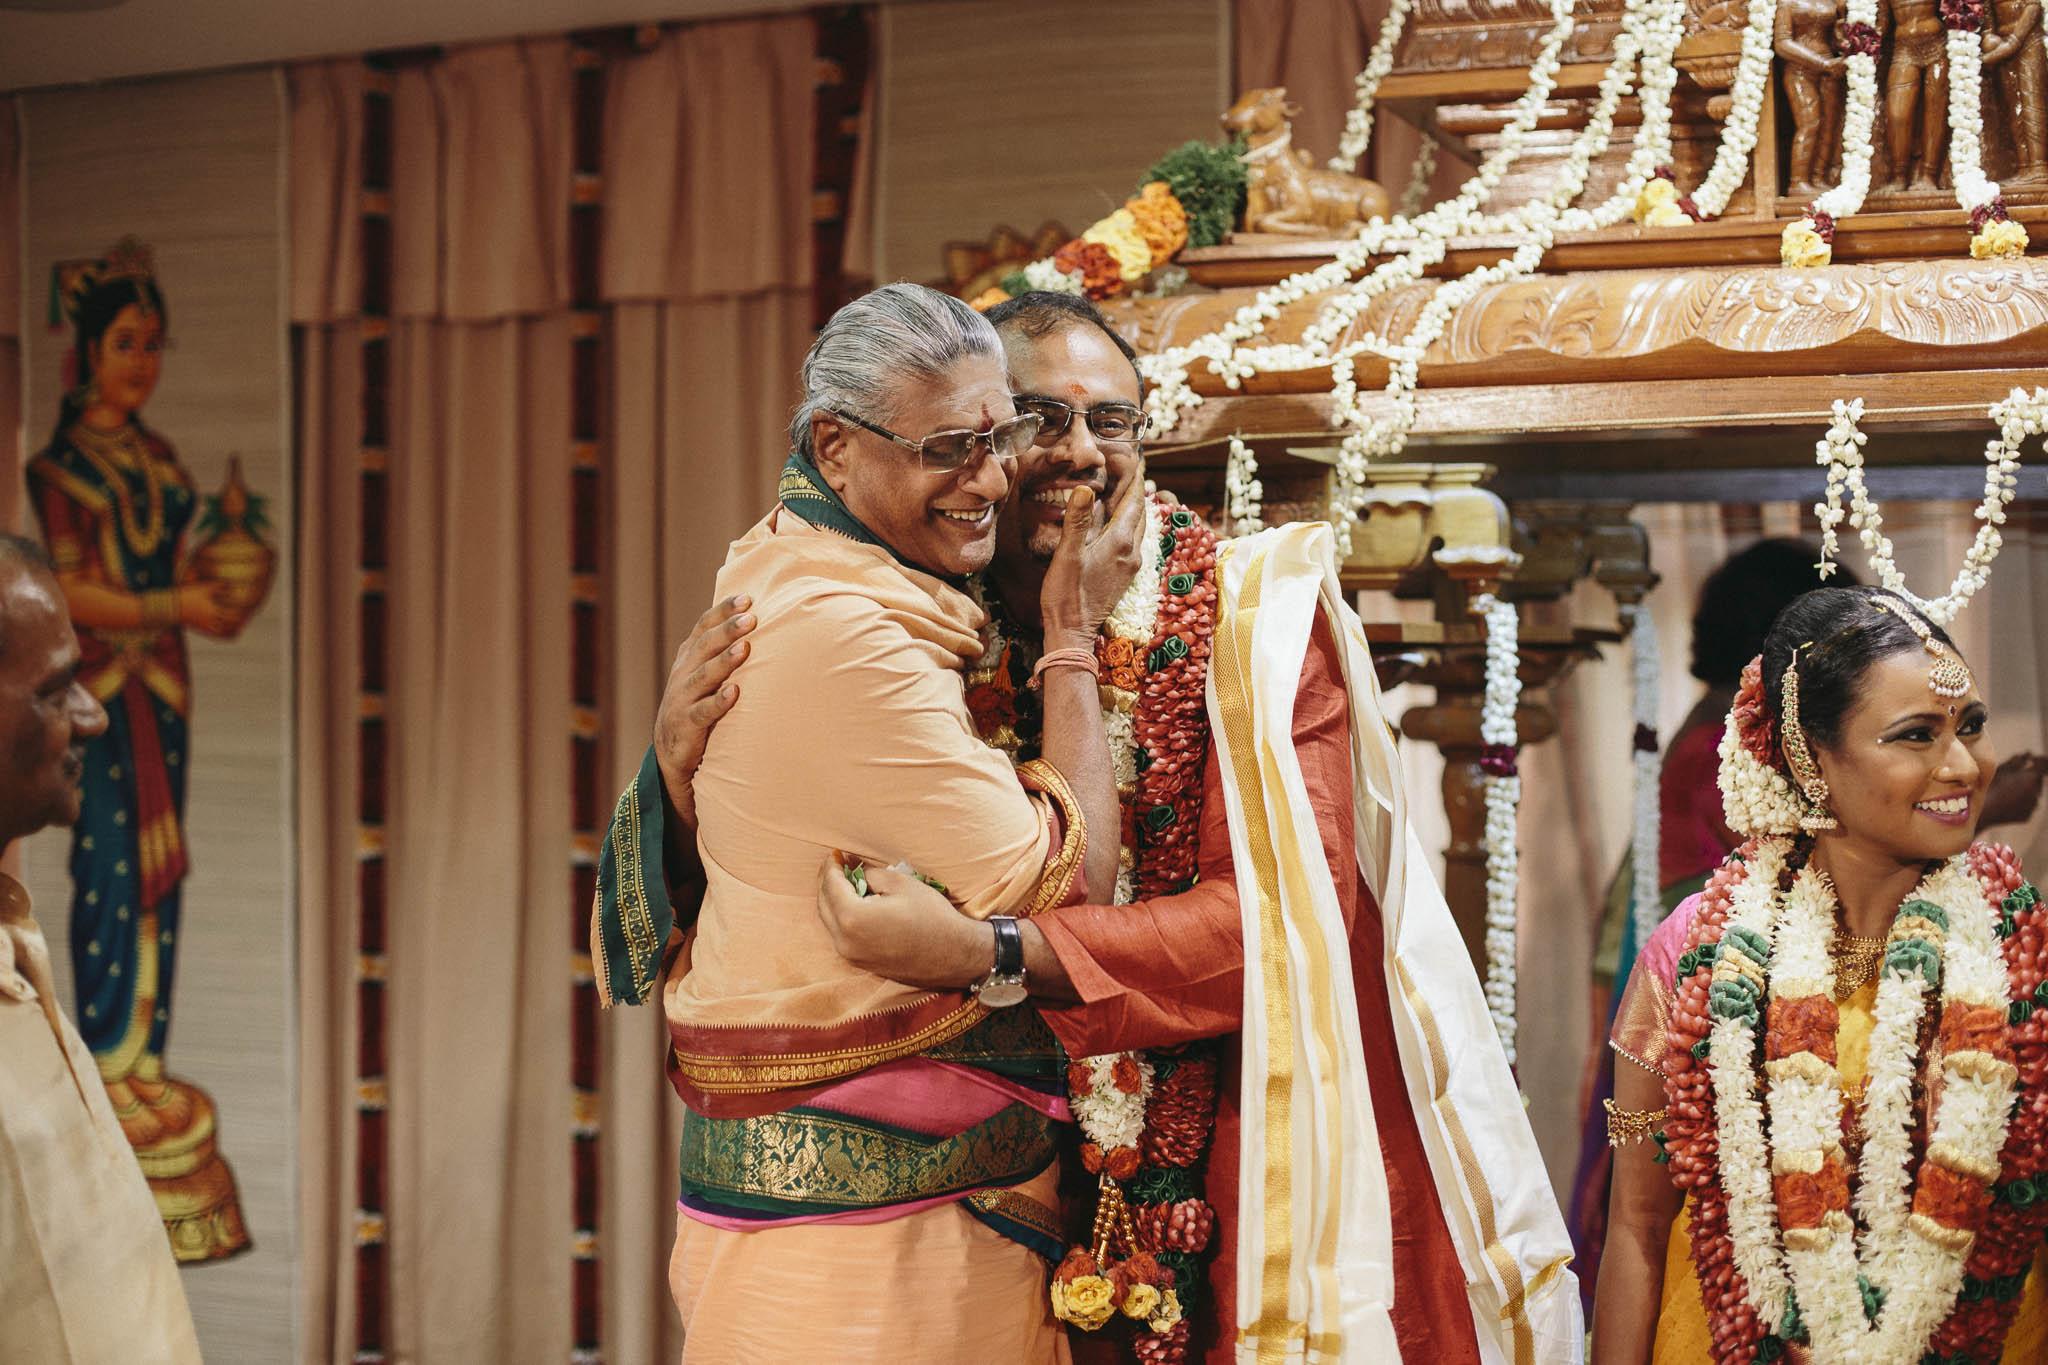 singapore-wedding-photographer-malay-indian-pre-wedding-travel-wmt-2015-70.jpg